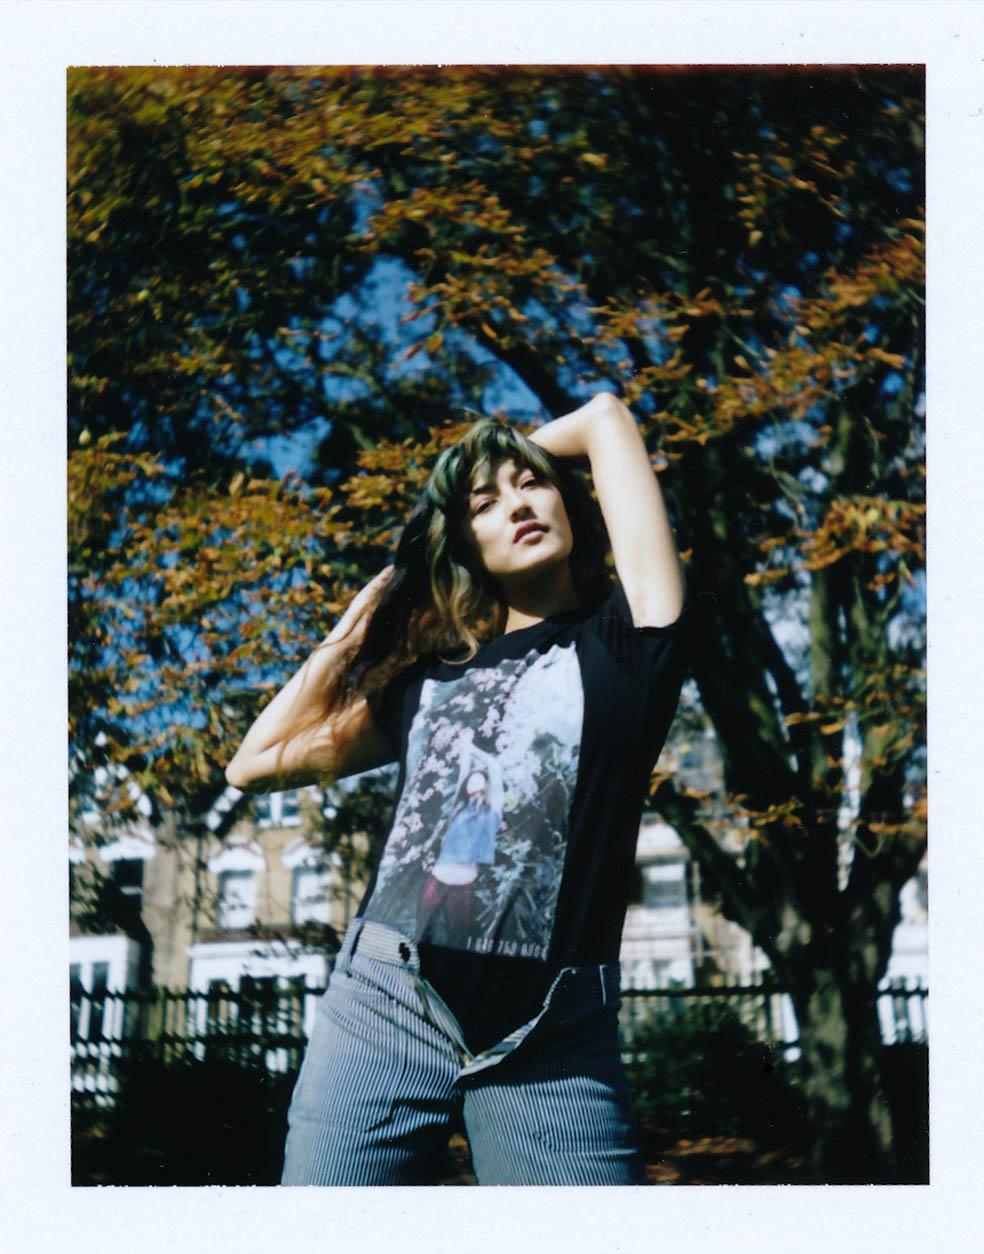 Stefan's Head - Francesca Allen - Polaroids